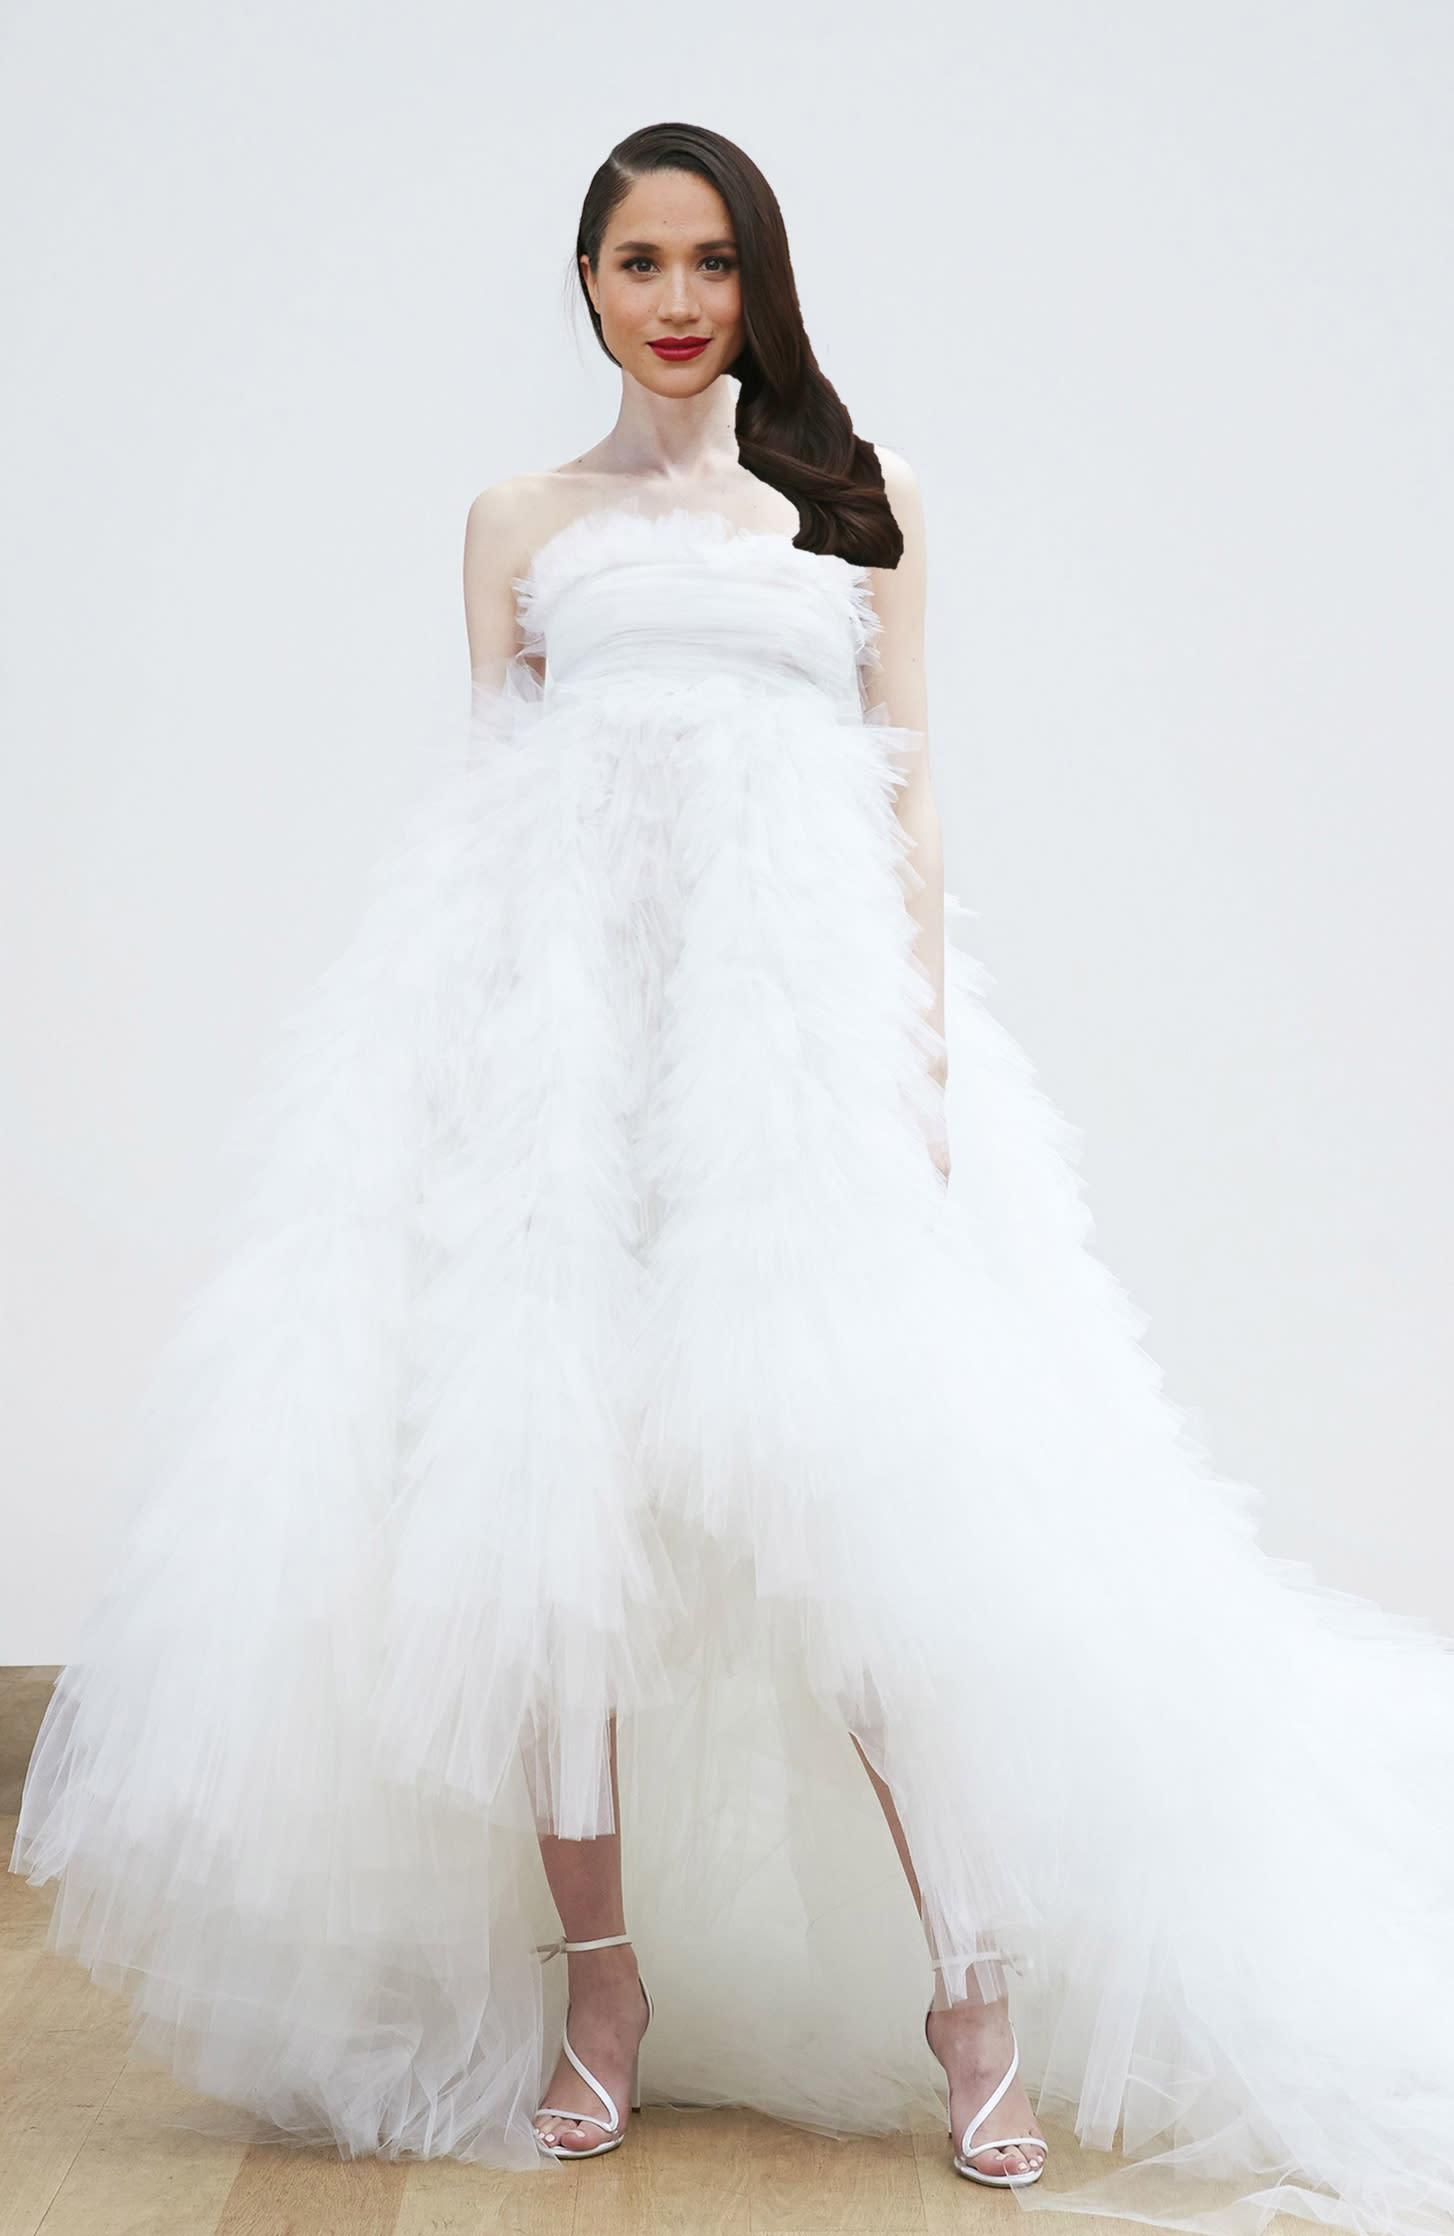 Meghan Markle Wedding Dress Predictions